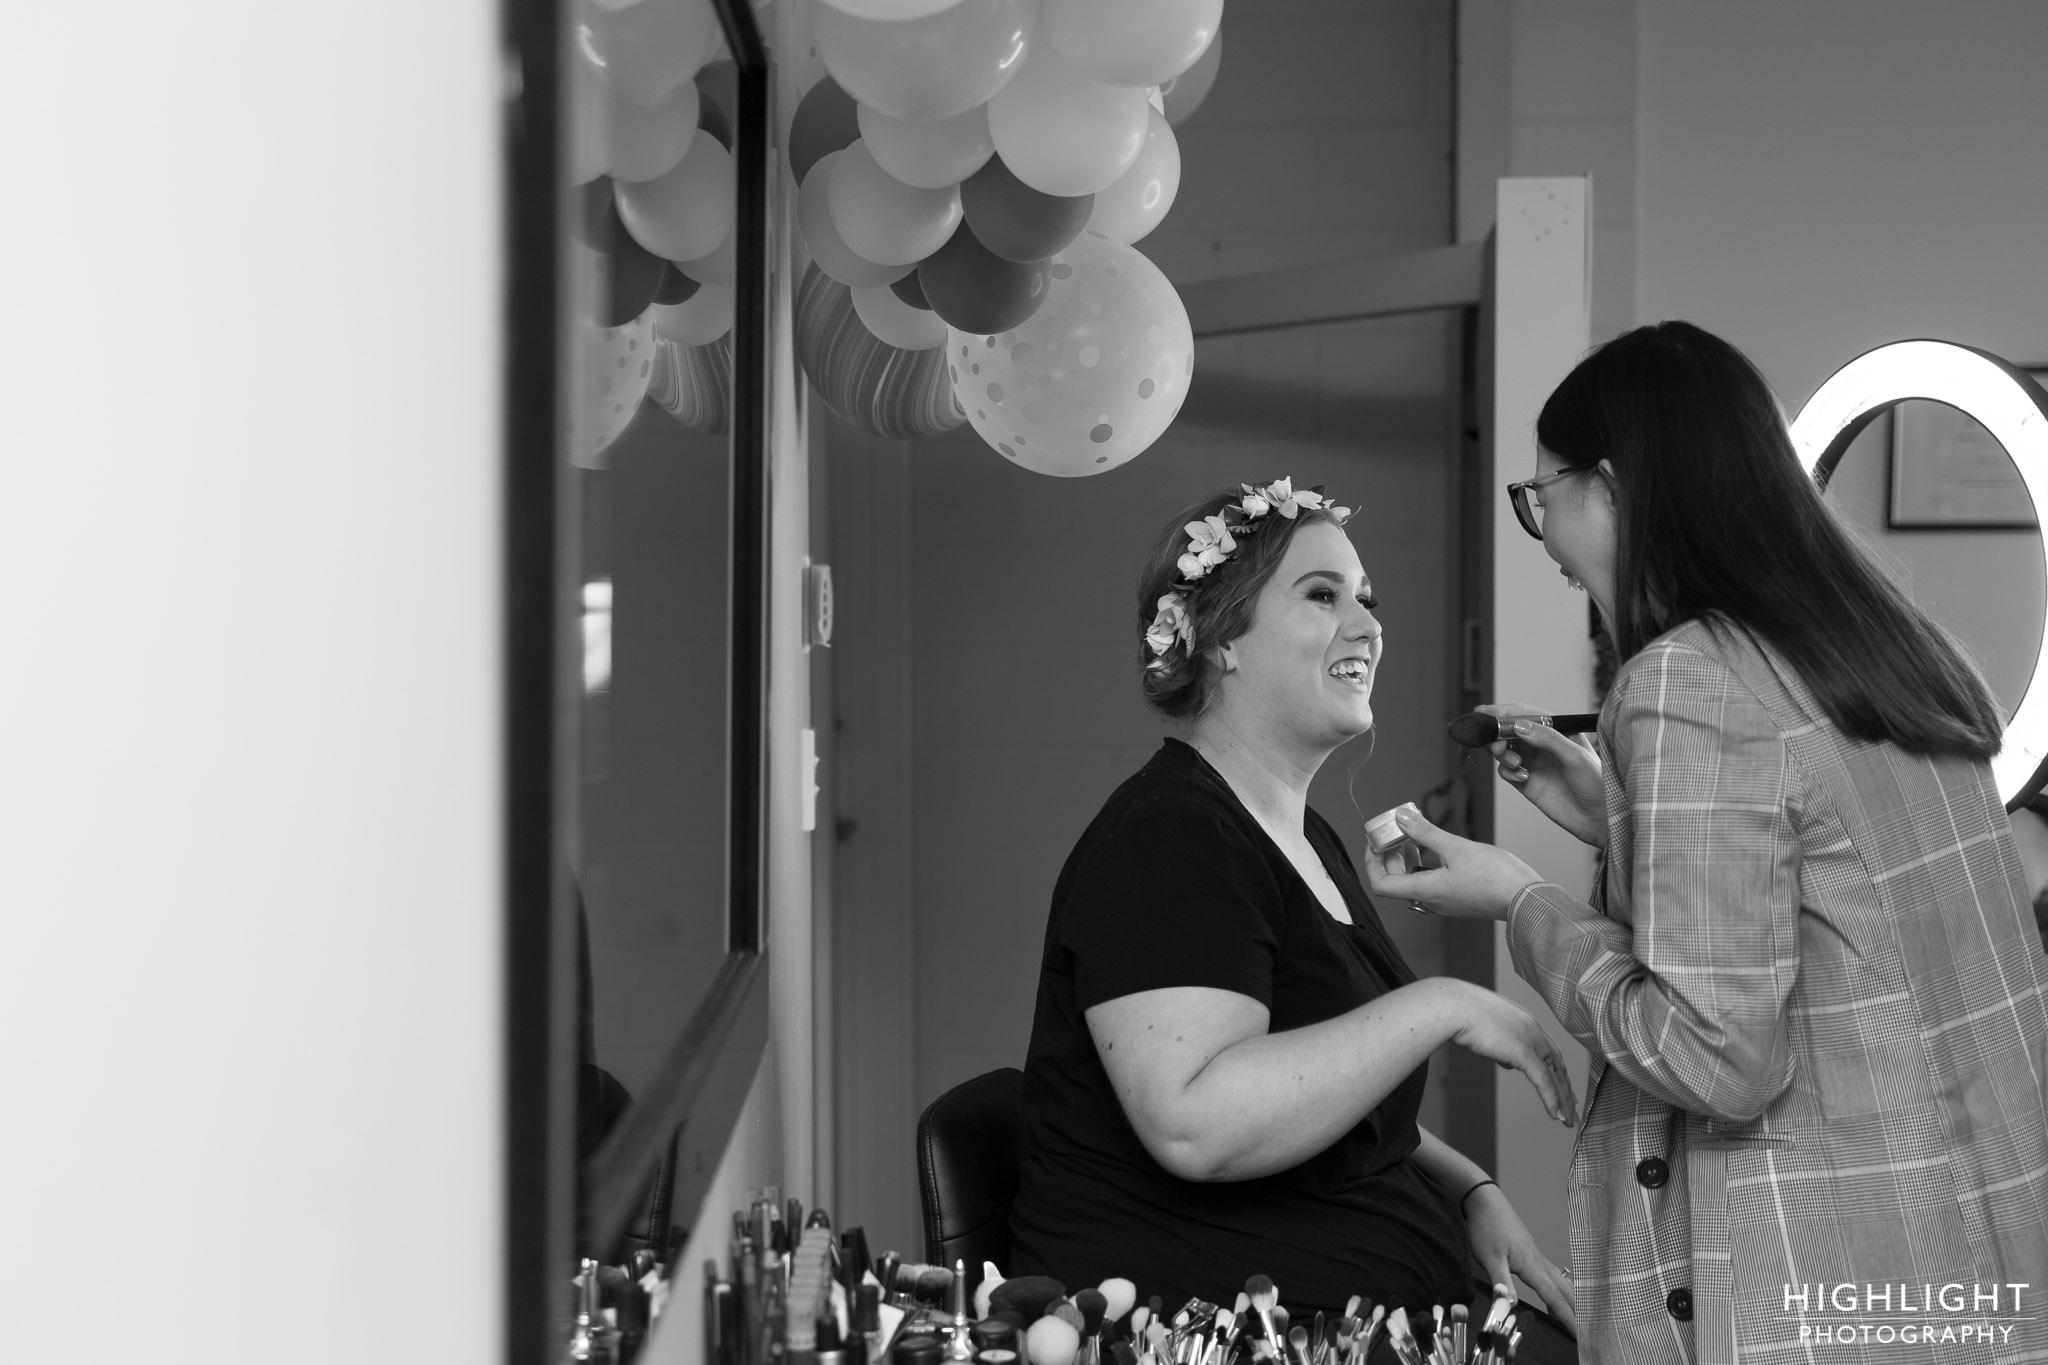 Highlight-wedding-photography-new-zealand-palmerston-north-6.jpg